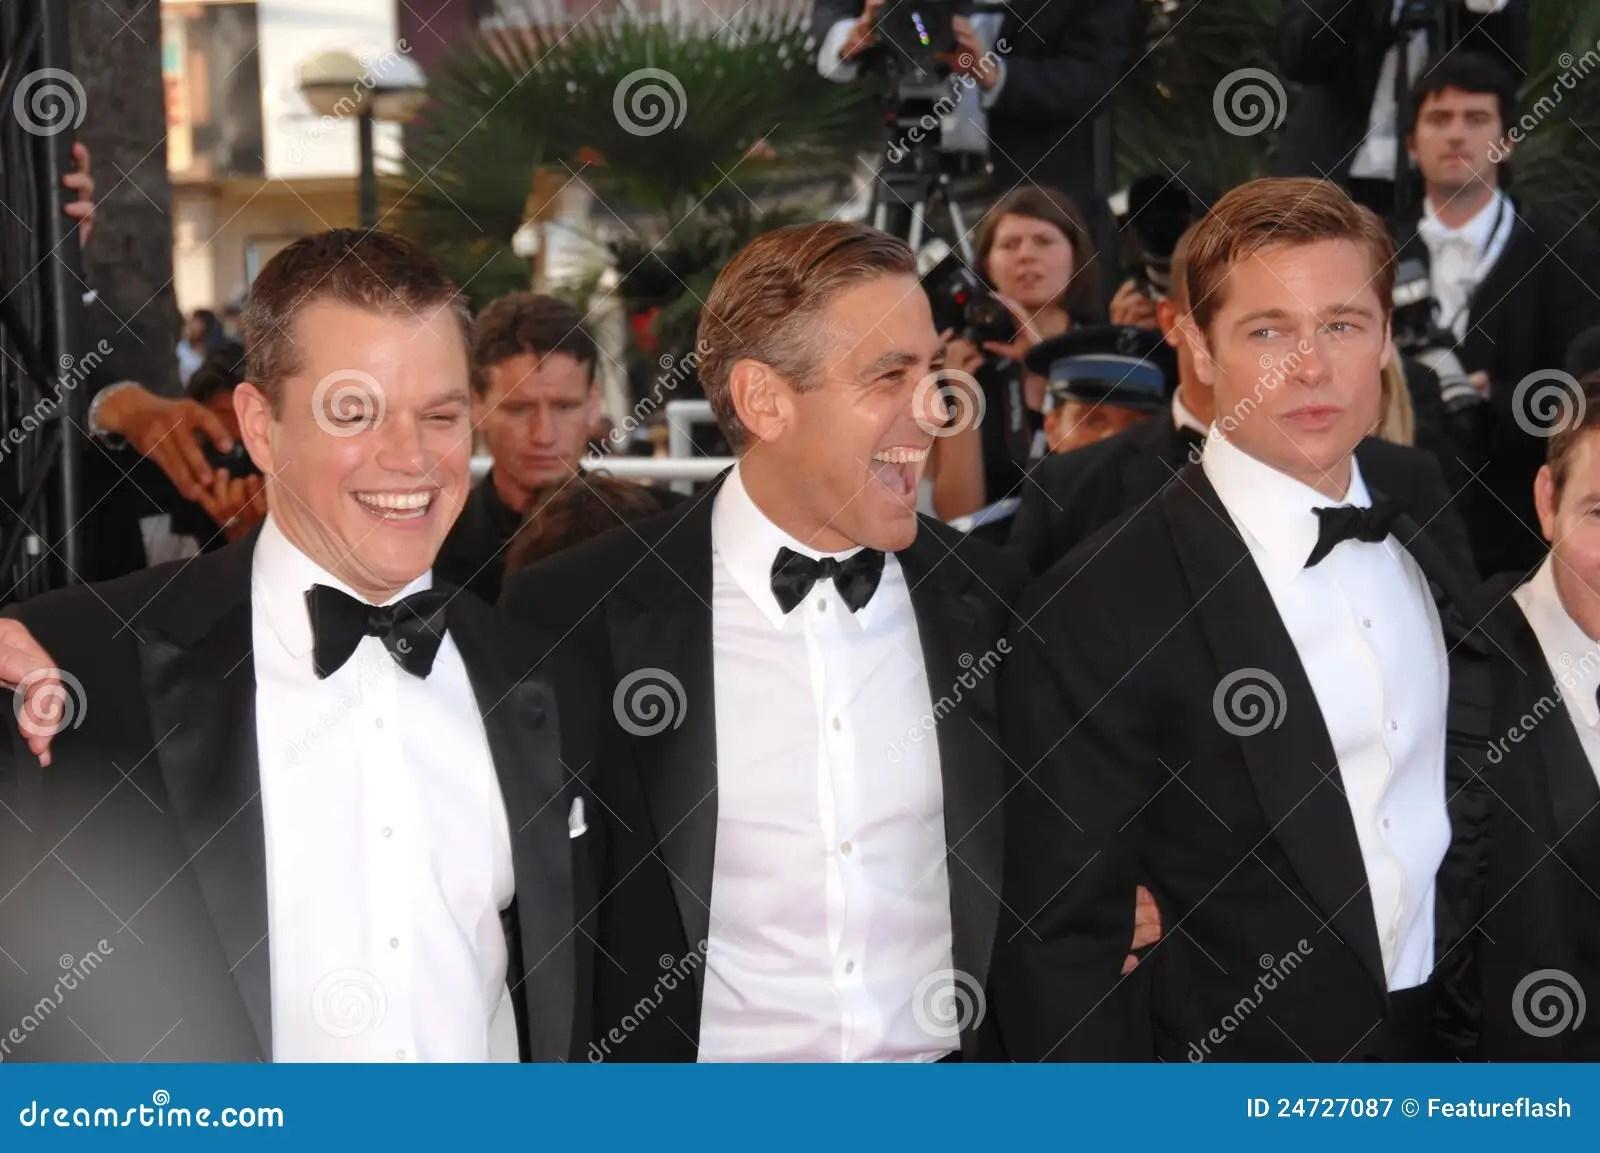 Brad Pitt, George Clooney, Matt Damon Photographie éditorial - Image: 24727087